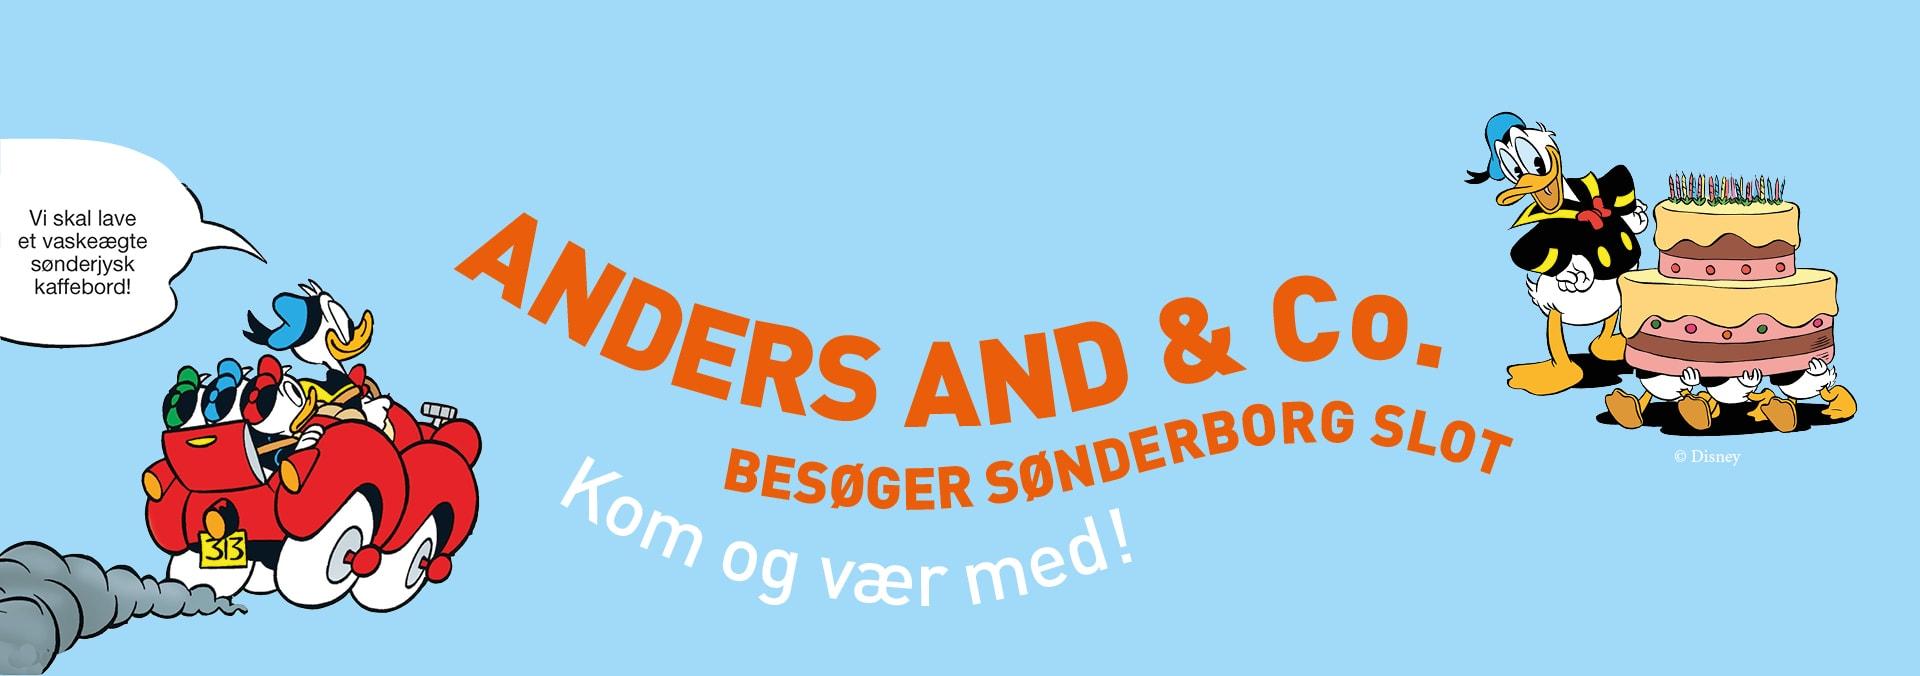 Anders And event på Sønderborg Slot